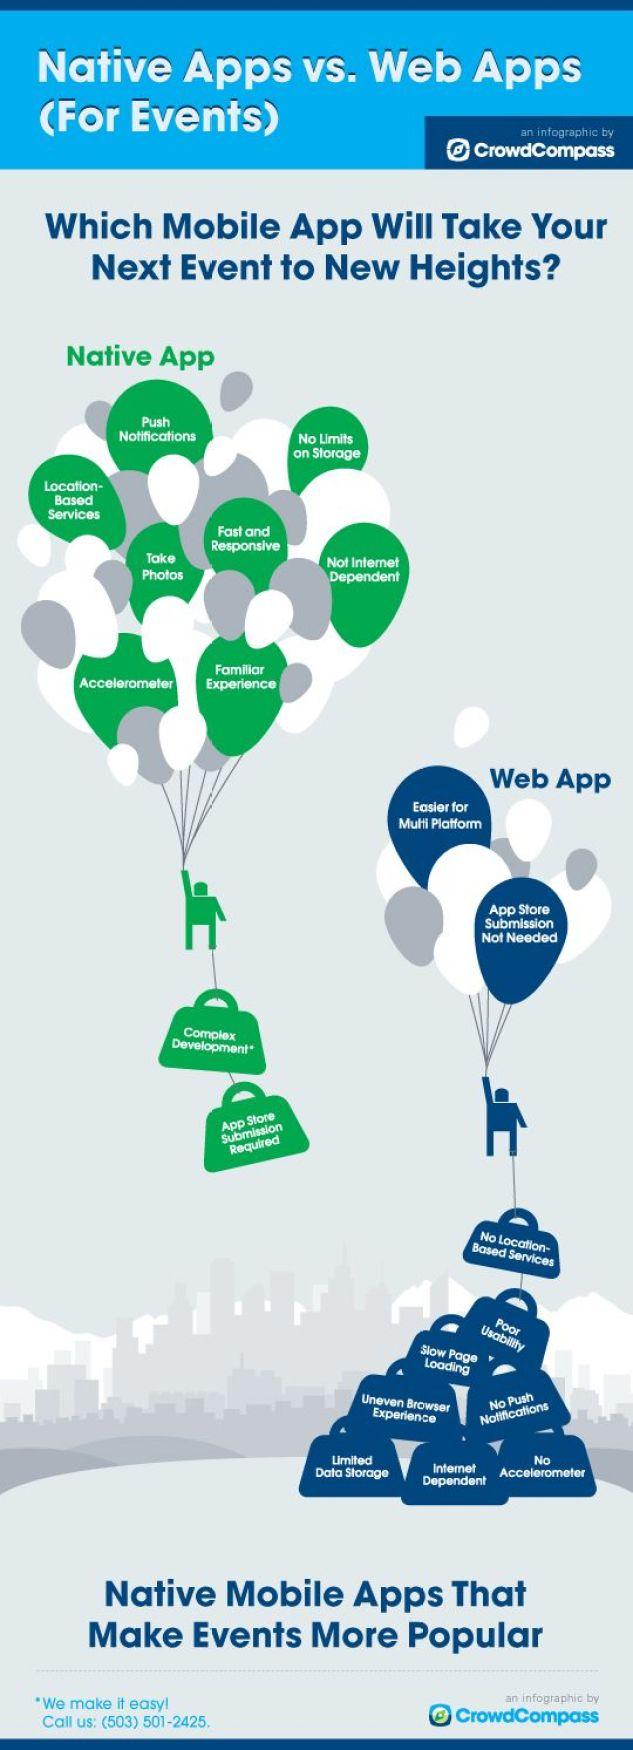 Para eventos: ¿es mejor Apps nativas o Apps web?